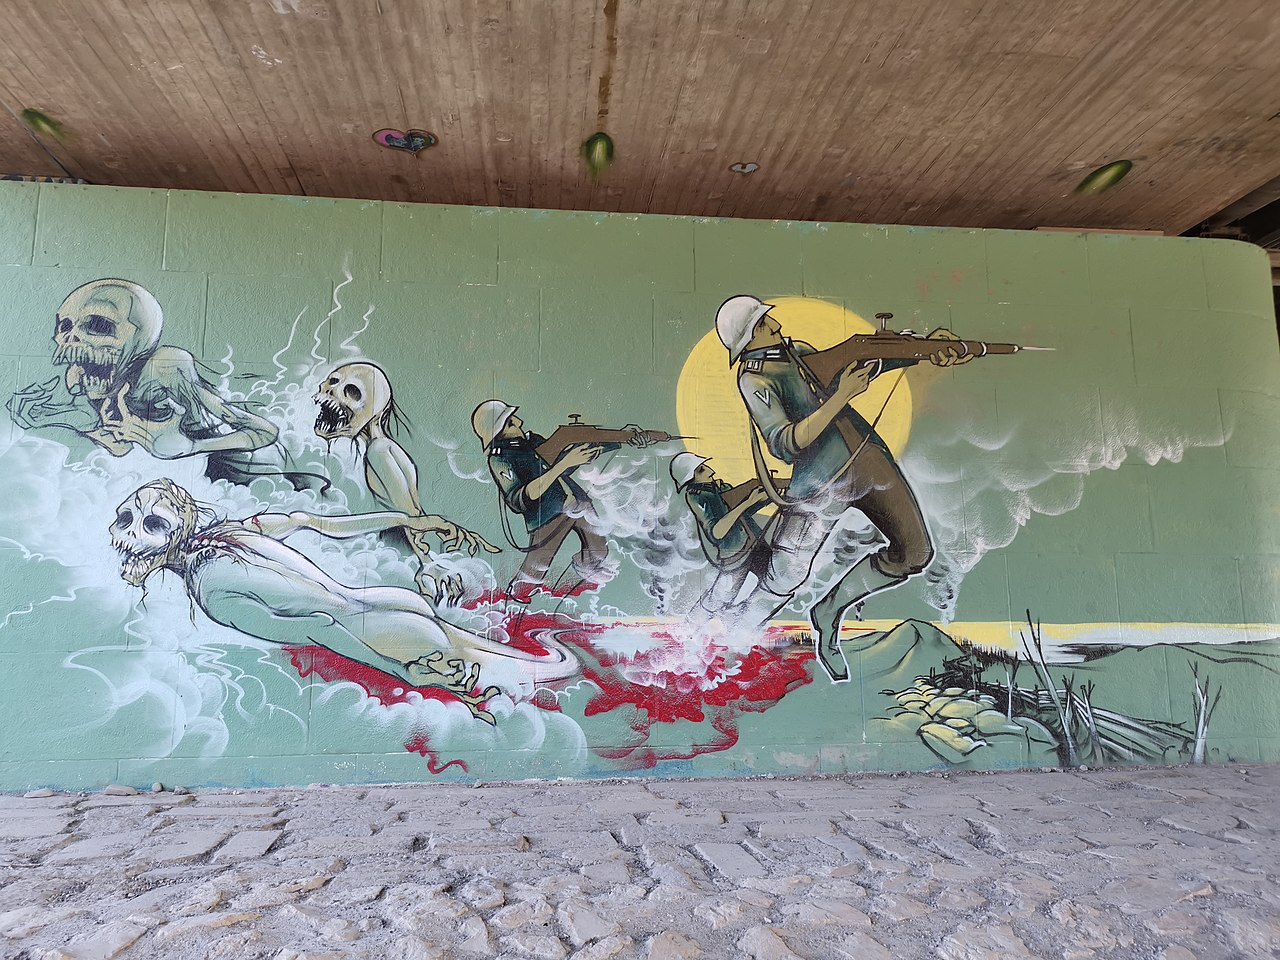 Graffiti Brudermühlbrücke München Isar Soldaten Sterben Tod.jpg